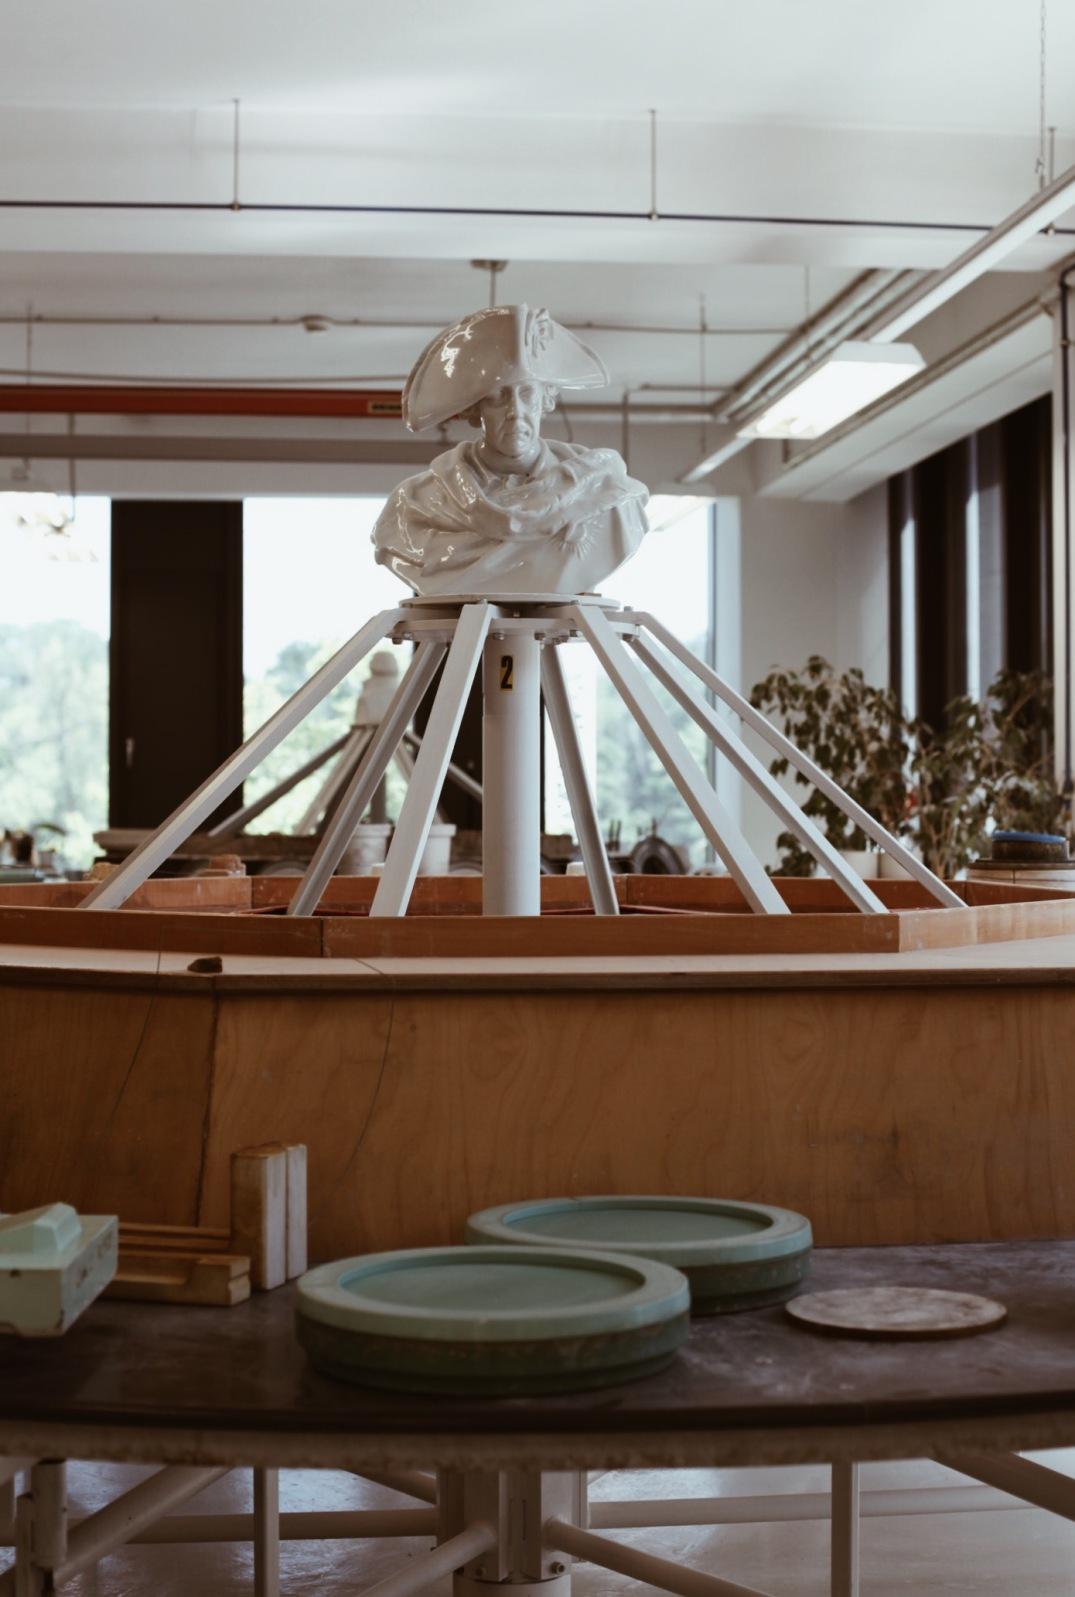 A visit to KPM - Berlin, Germany - Königliche Porzellan-Manufaktur